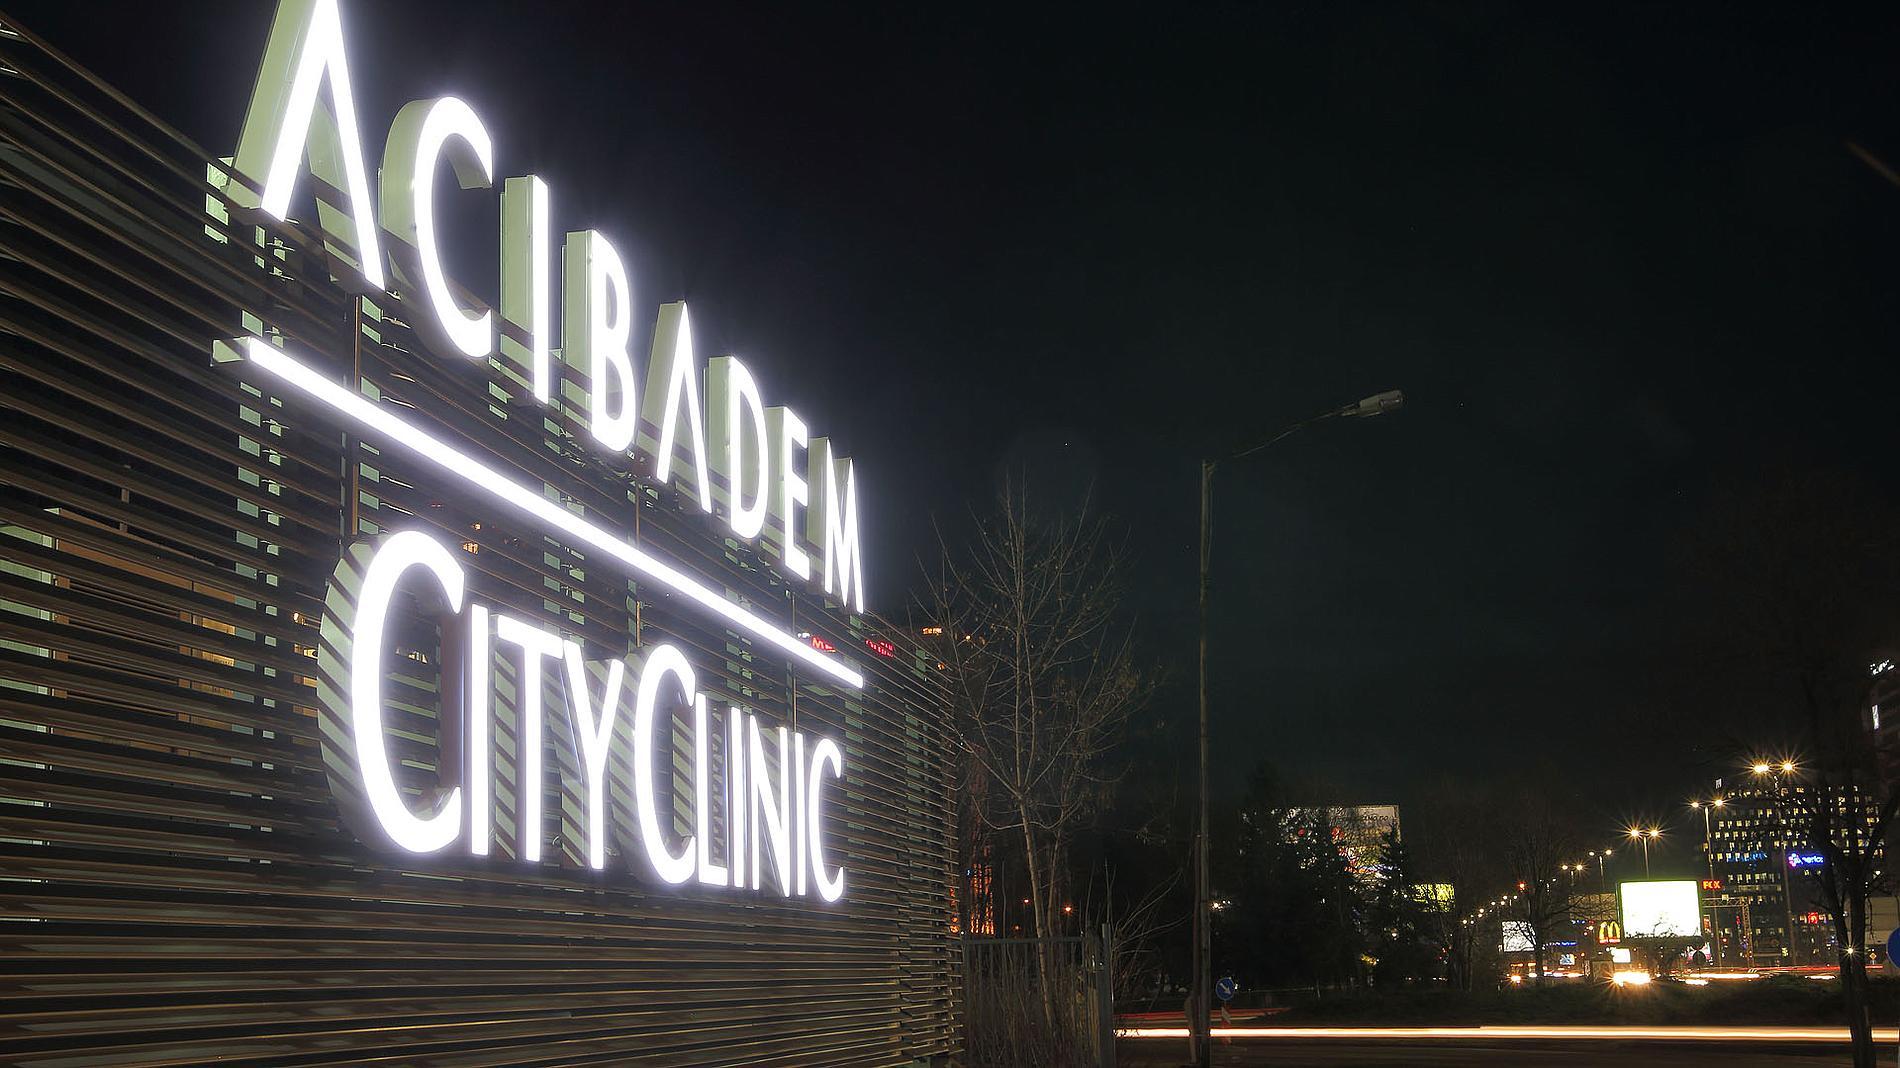 Illuminated letters Acibadem City Clinic, Sofia Oncology